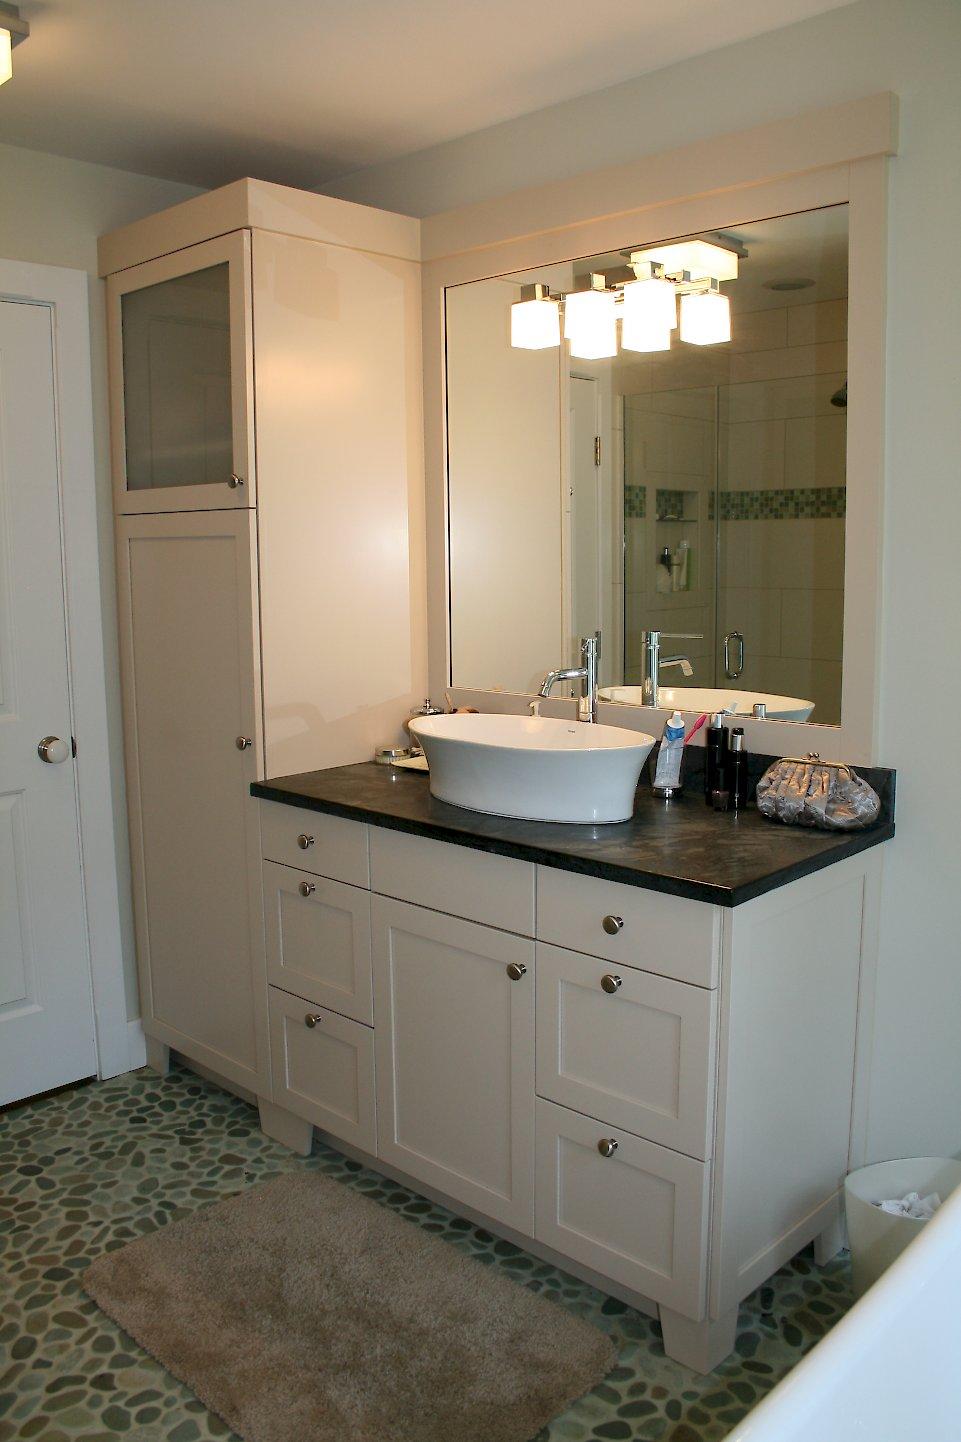 An Exquisite Combination Categorized Under Transitional Bathroom Portfolio